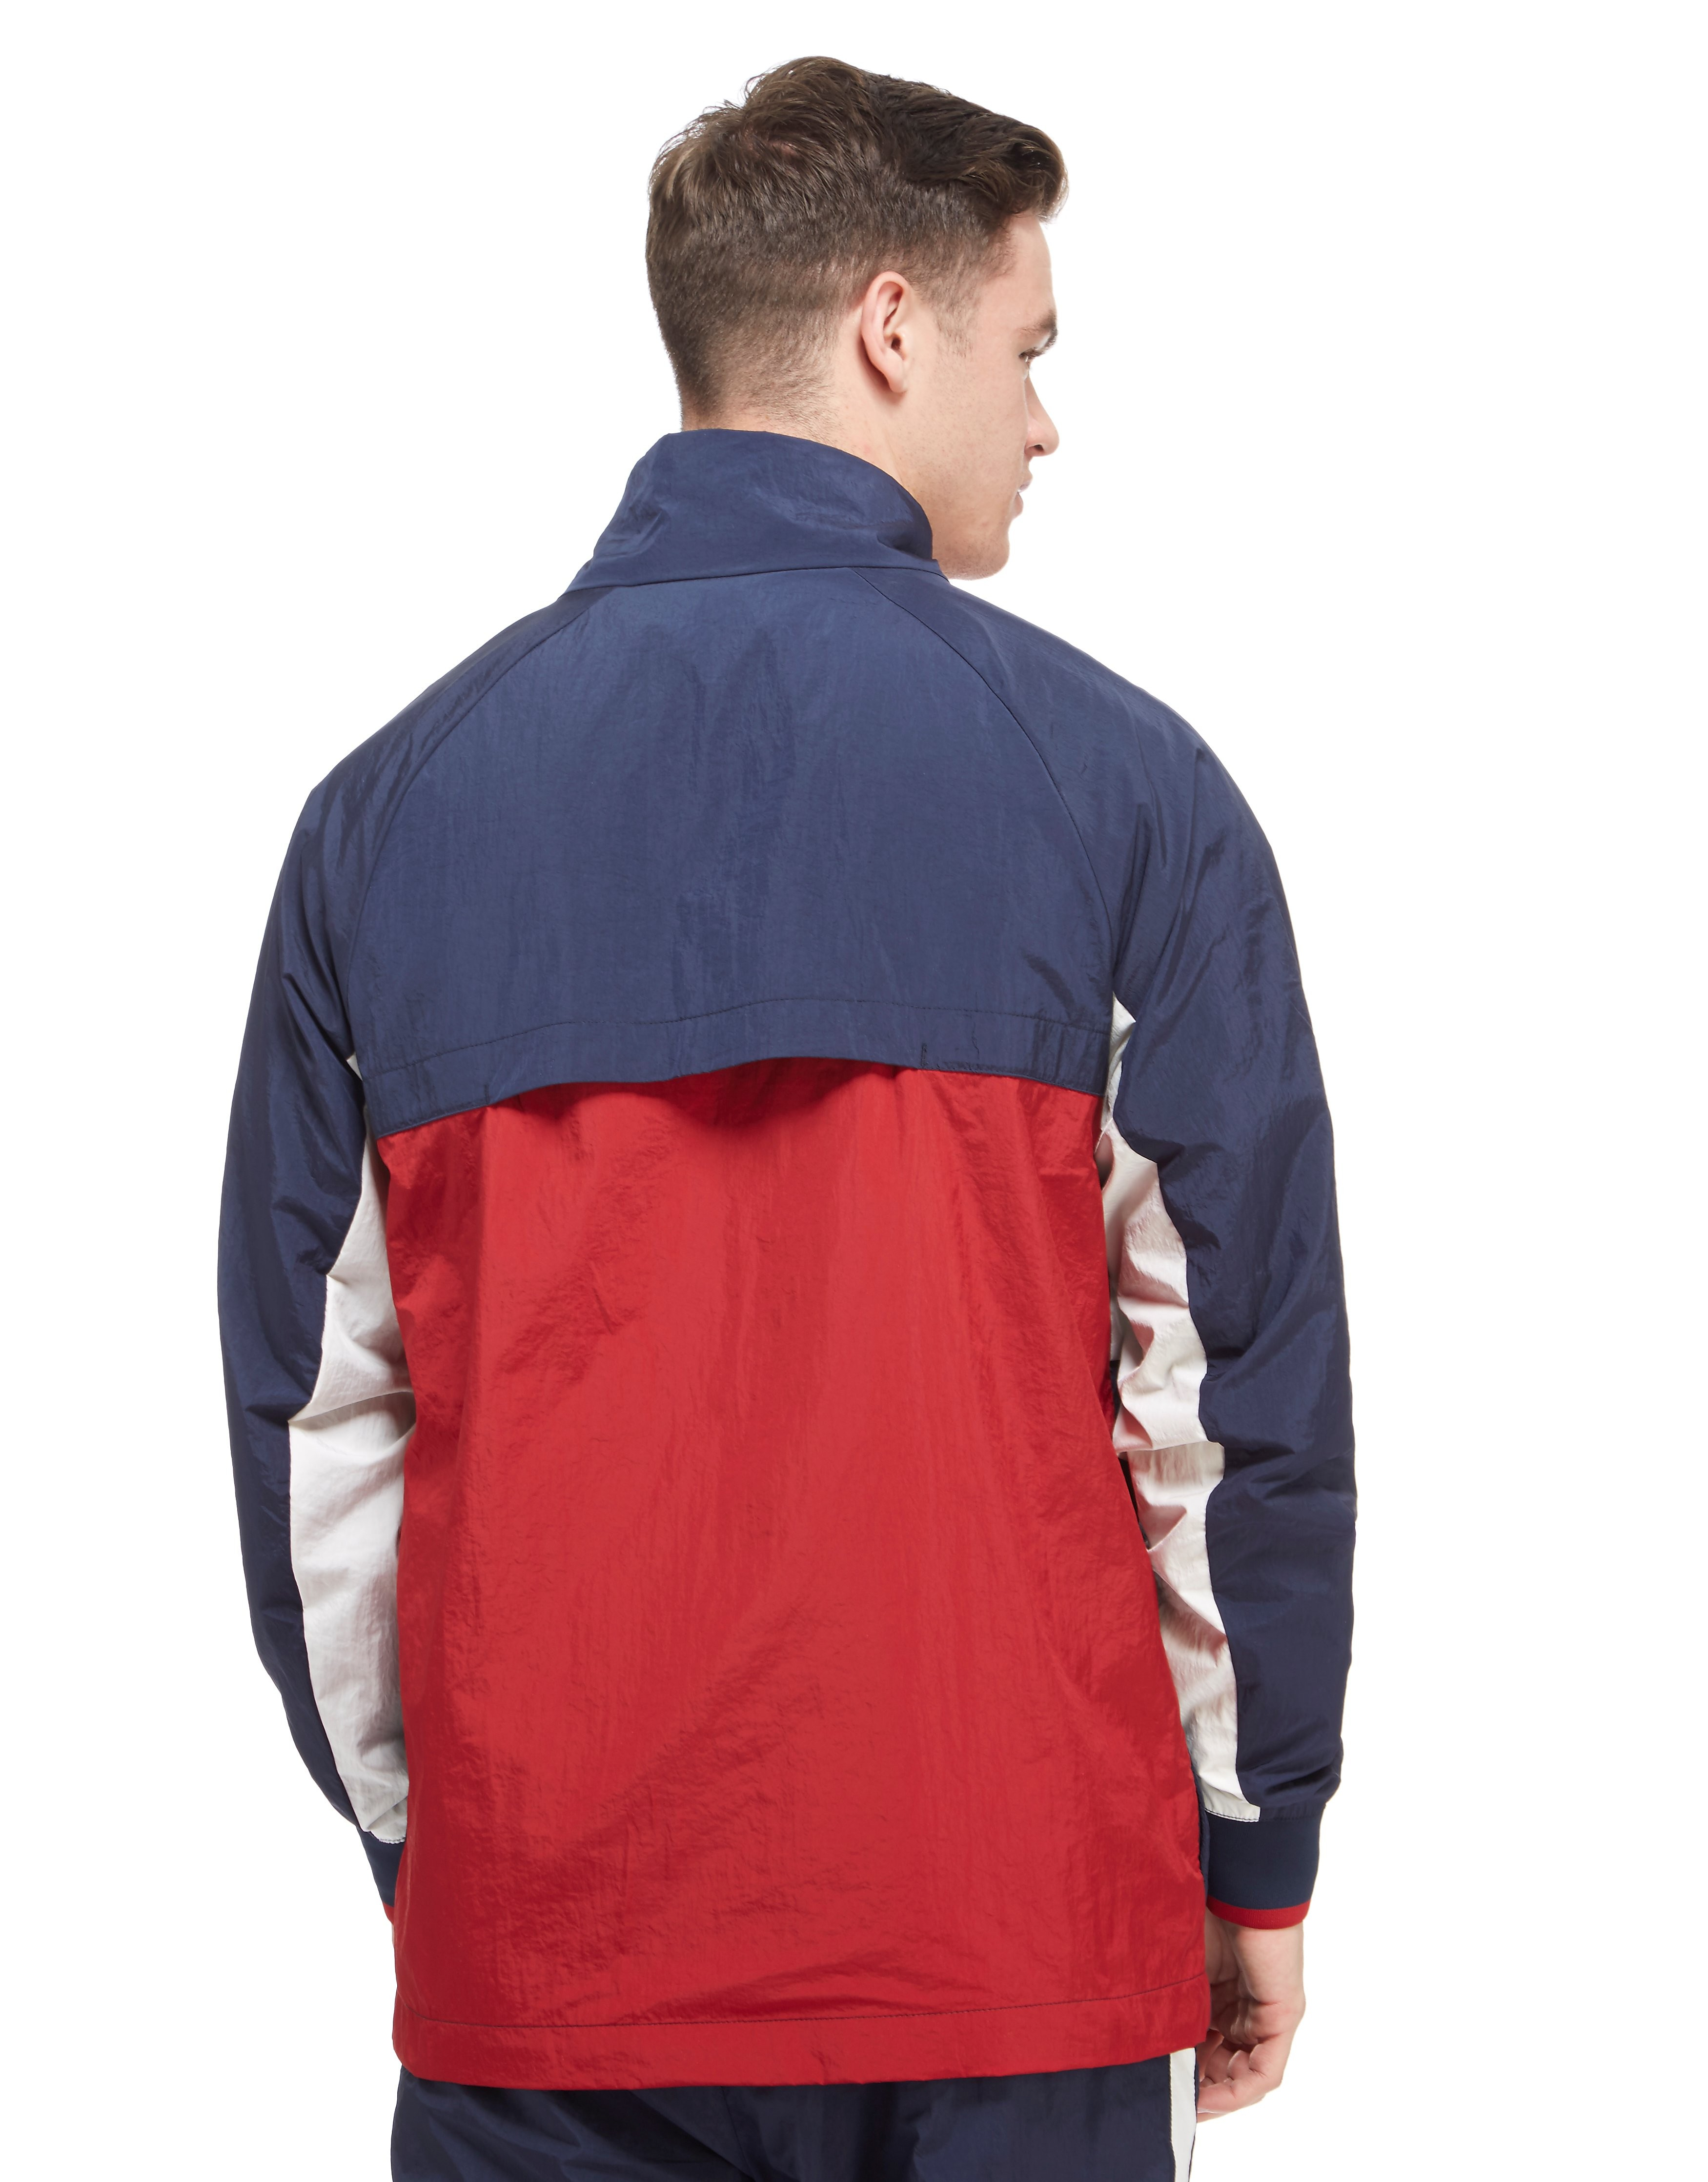 Nike Archive Woven Jacket